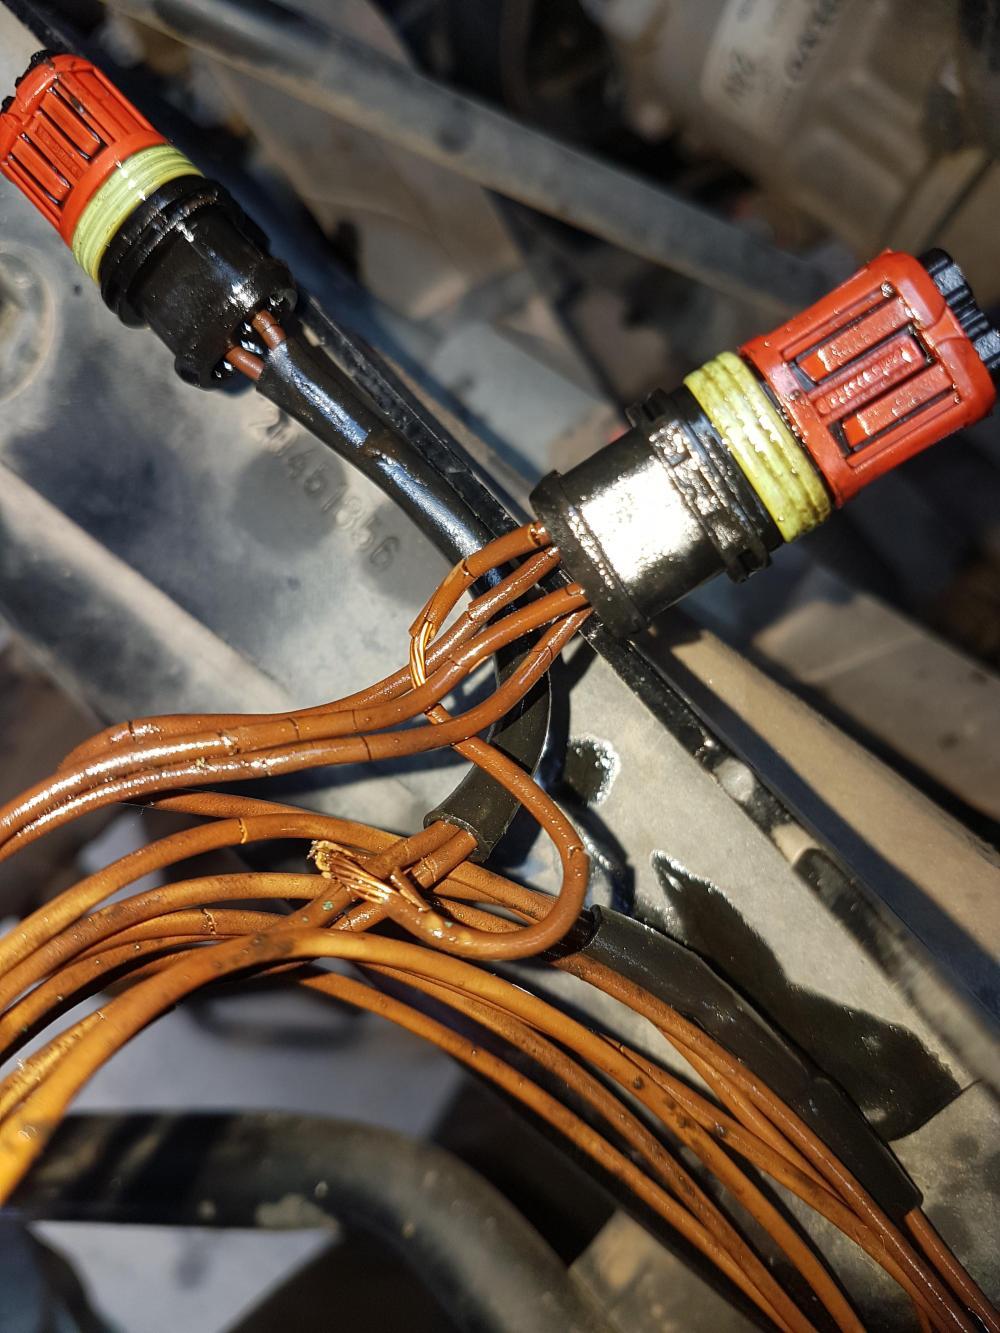 medium resolution of volvo d16 wiring harness failure wiring diagram post volvo truck wiring harness